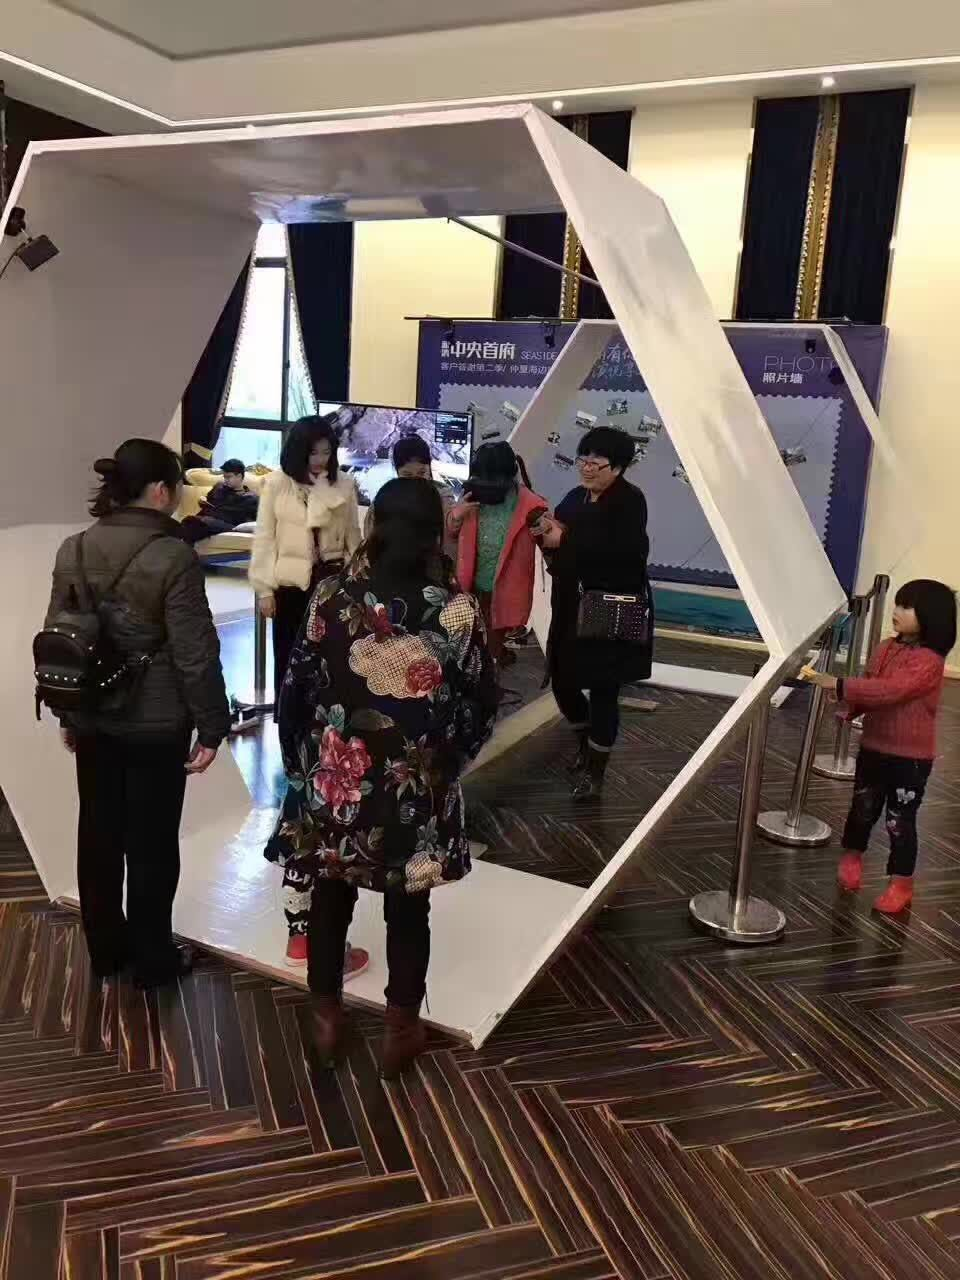 VR 高空救猫租赁图片/VR 高空救猫租赁样板图 (2)